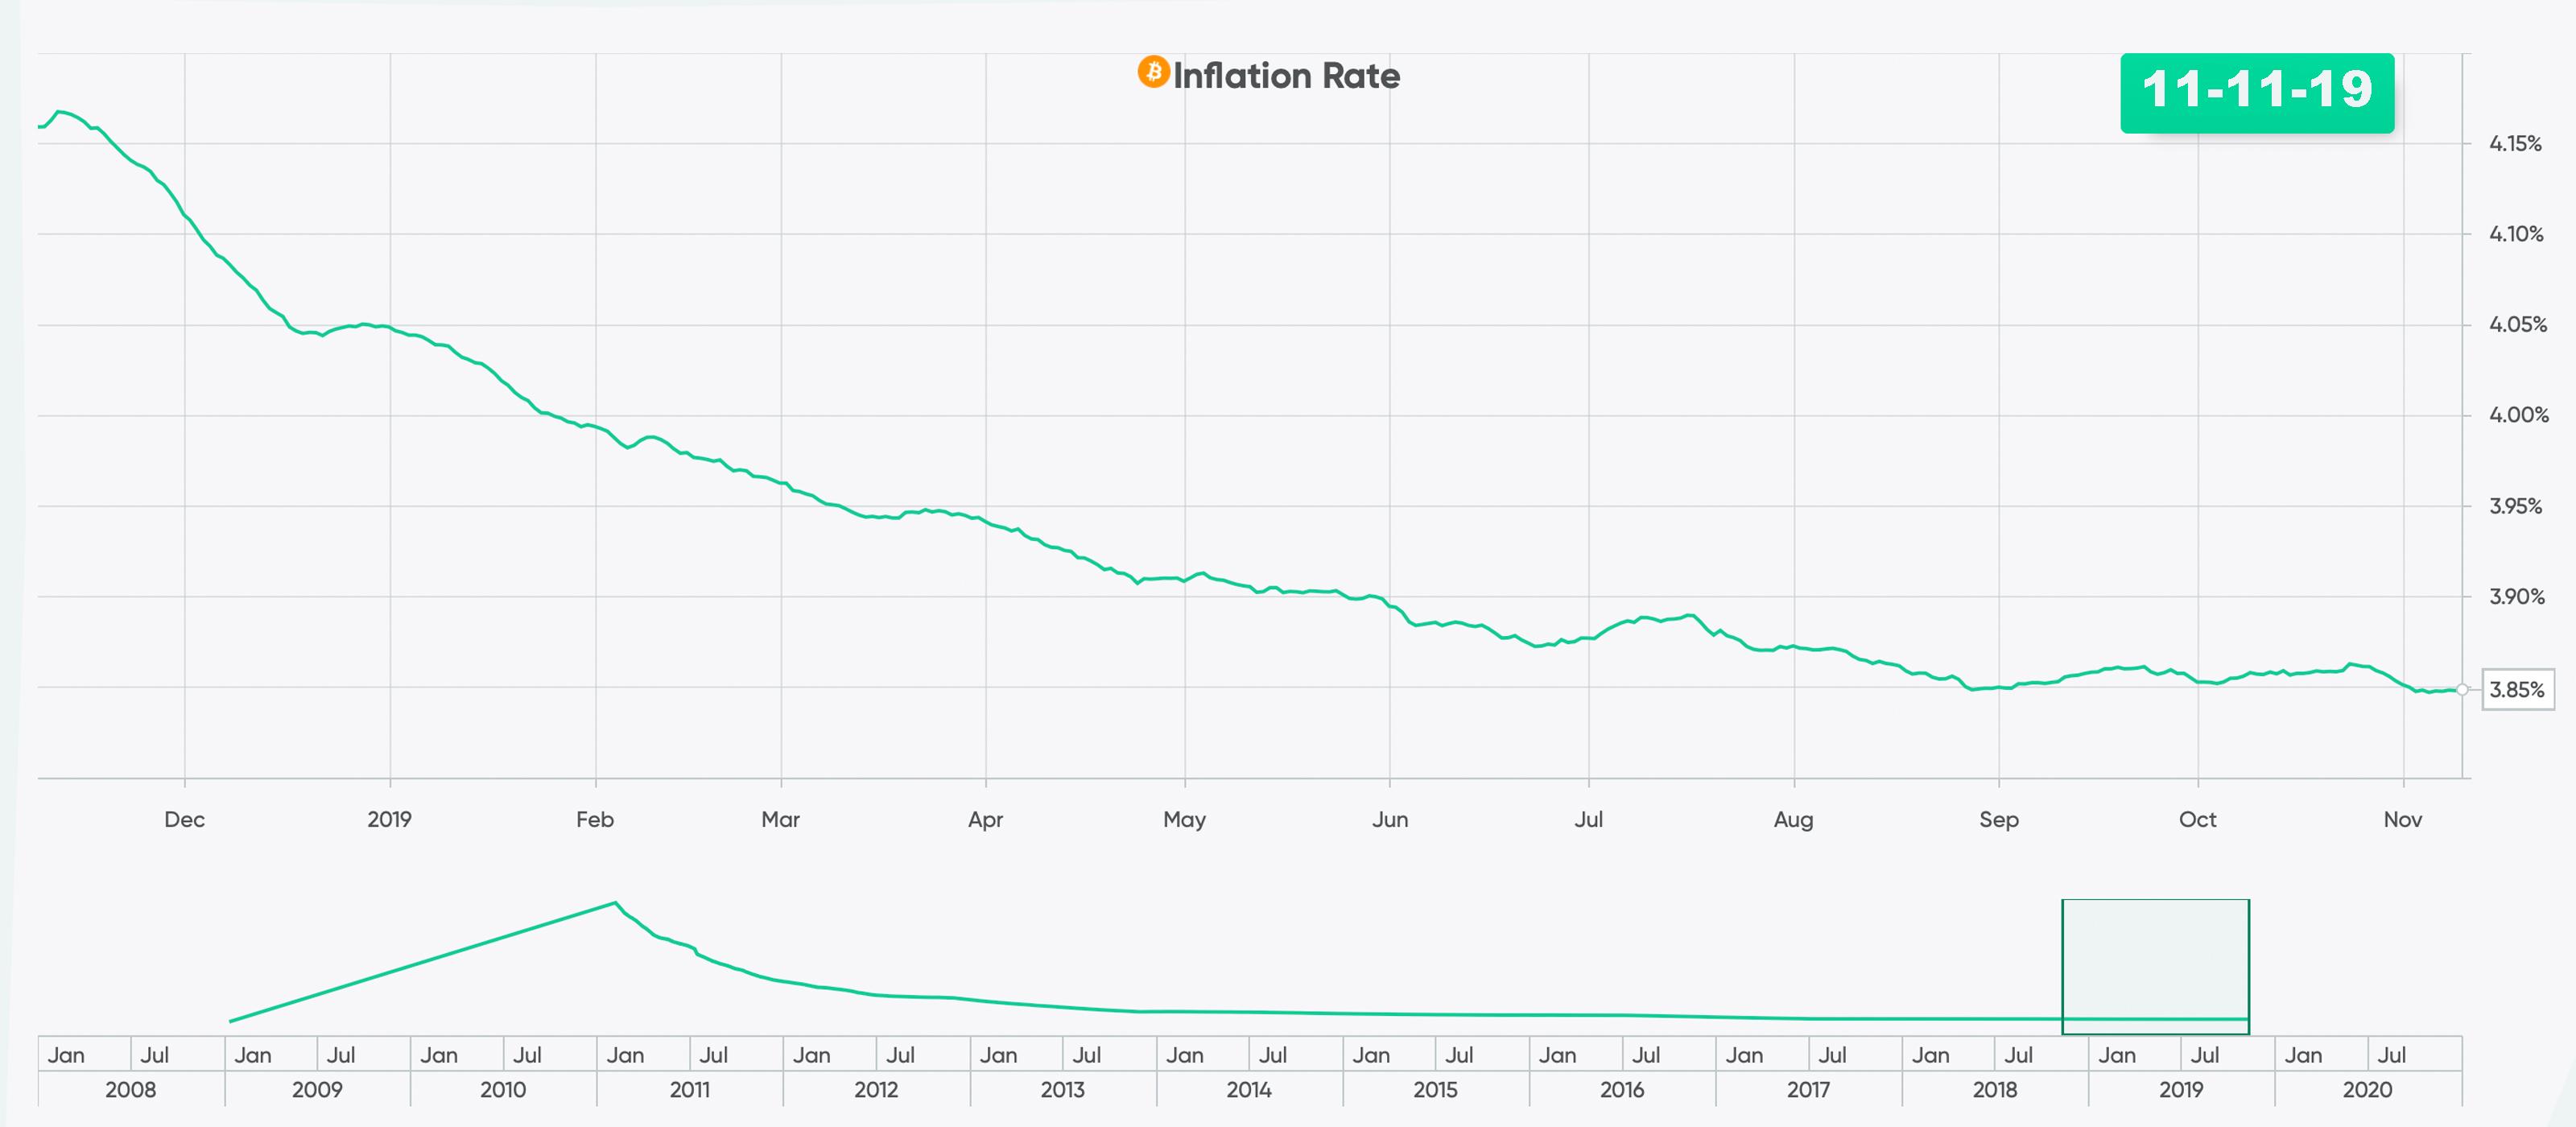 "6 meses antes de reducir a la mitad las señales indican que los mineros de Bitcoin están acumulando ""ancho ="" 3200 ""altura ="" 1400 ""srcset ="" https : //news.bitcoin.com/wp-content/uploads/2019/11/ifrbtc.jpg 3200w, https://news.bitcoin.com/wp-content/uploads/2019/11/ifrbtc-300x131.jpg 300w , https://news.bitcoin.com/wp-content/uploads/2019/11/ifrbtc-768x336.jpg 768w, https://news.bitcoin.com/wp-content/uploads/2019/11/ifrbtc- 1024x448.jpg 1024w, https://news.bitcoin.com/wp-content/uploads/2019/11/ifrbtc-696x305.jpg 696w, https://news.bitcoin.com/wp-content/uploads/2019/ 11 / ifrbtc-1392x609.jpg 1392w, https://news.bitcoin.com/wp-content/uploads/2019/11/ifrbtc-1068x467.jpg 1068w, https://news.bitcoin.com/wp-content/ cargas / 2019/11 / ifrbtc-960x420.jpg 960w ""tamaños ="" (ancho máximo: 3200px) 100vw, 3200px"